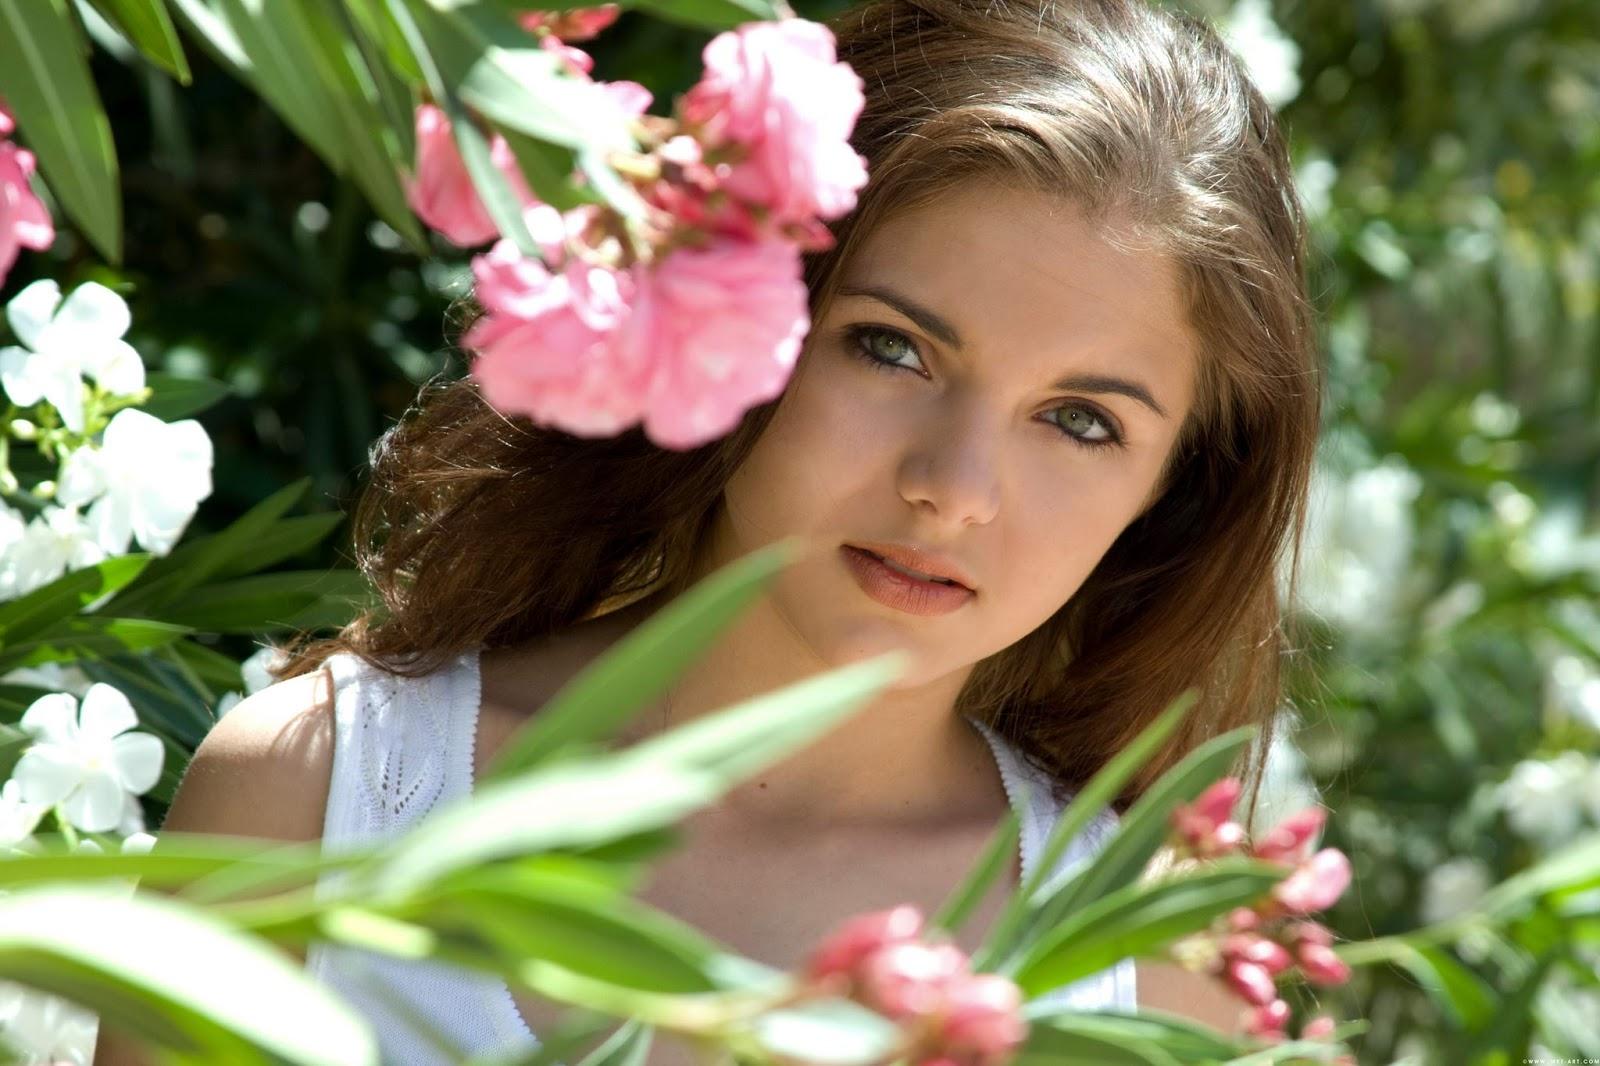 Flowers online 2018 flower with girl wallpaper flowers online izmirmasajfo